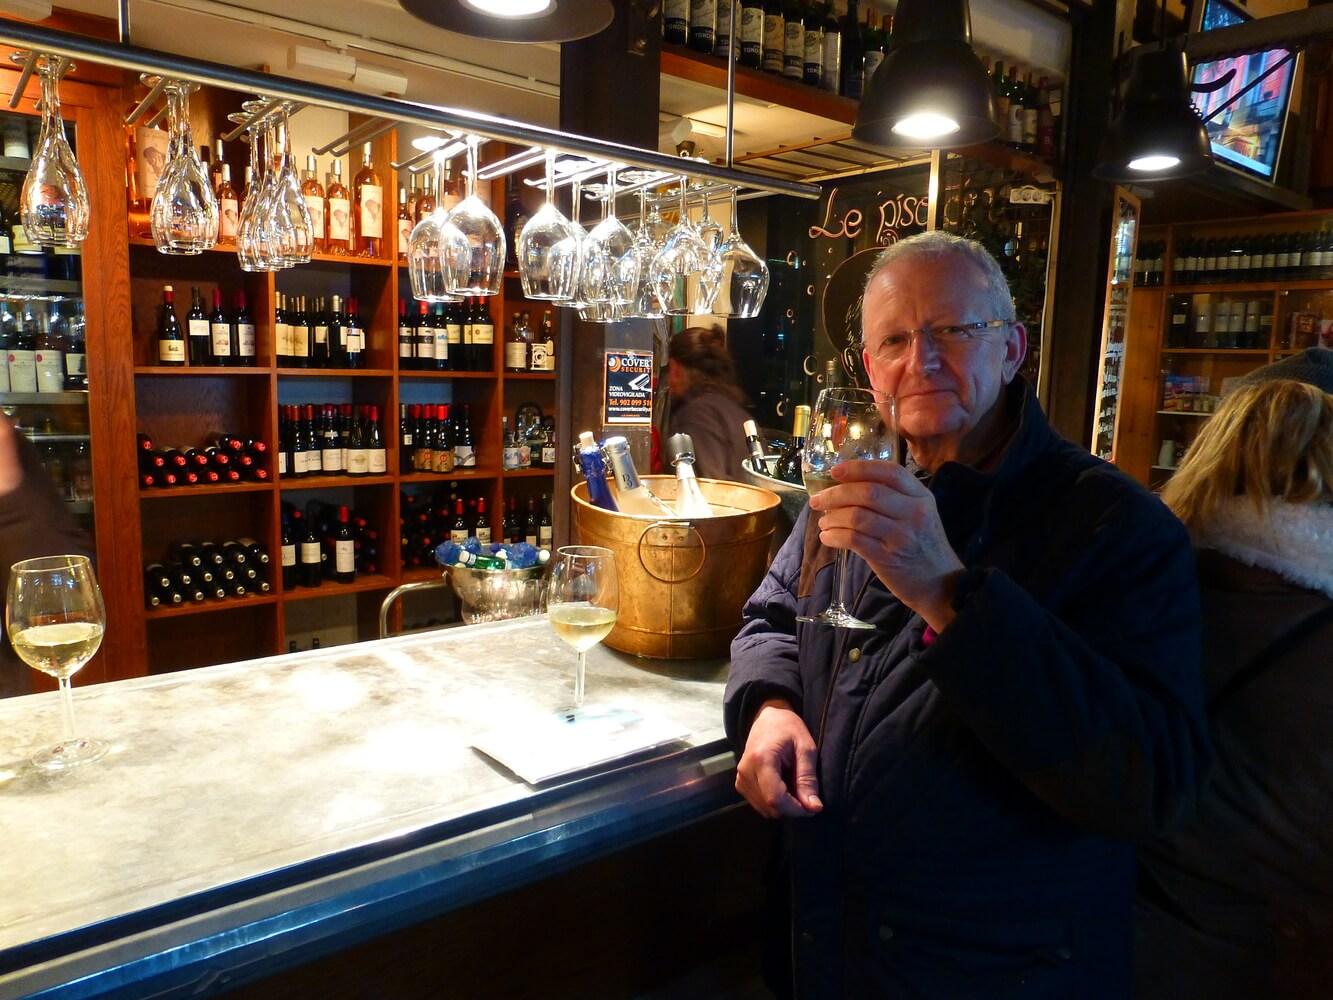 Visit of students of Manchester Grammar School, Wine tasting